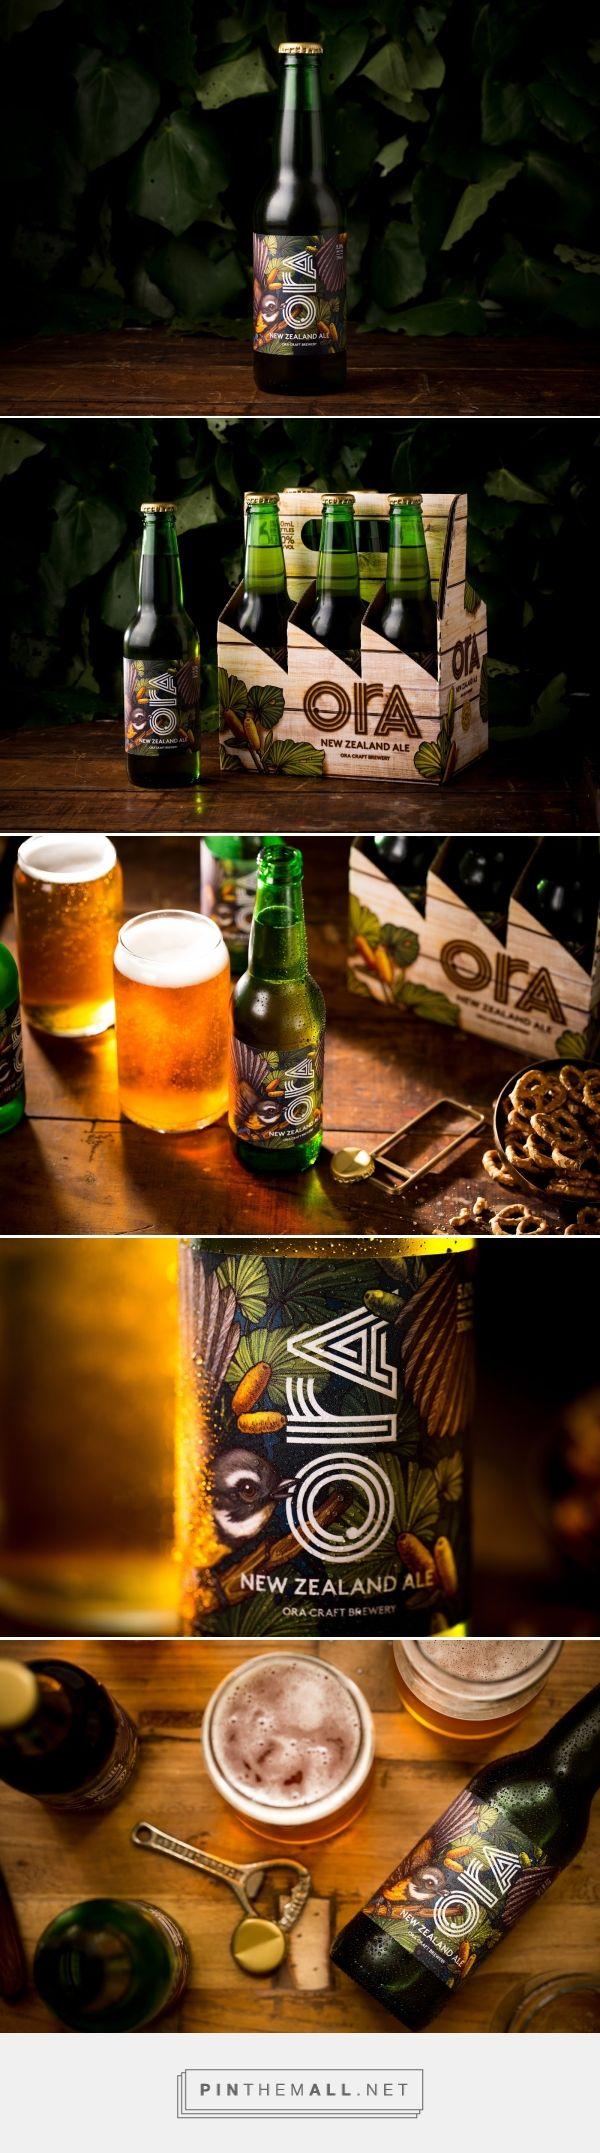 Ora - New Zealand Ale packaging design by Monique Robins - http://www.packagingoftheworld.com/2017/09/ora-ale.html